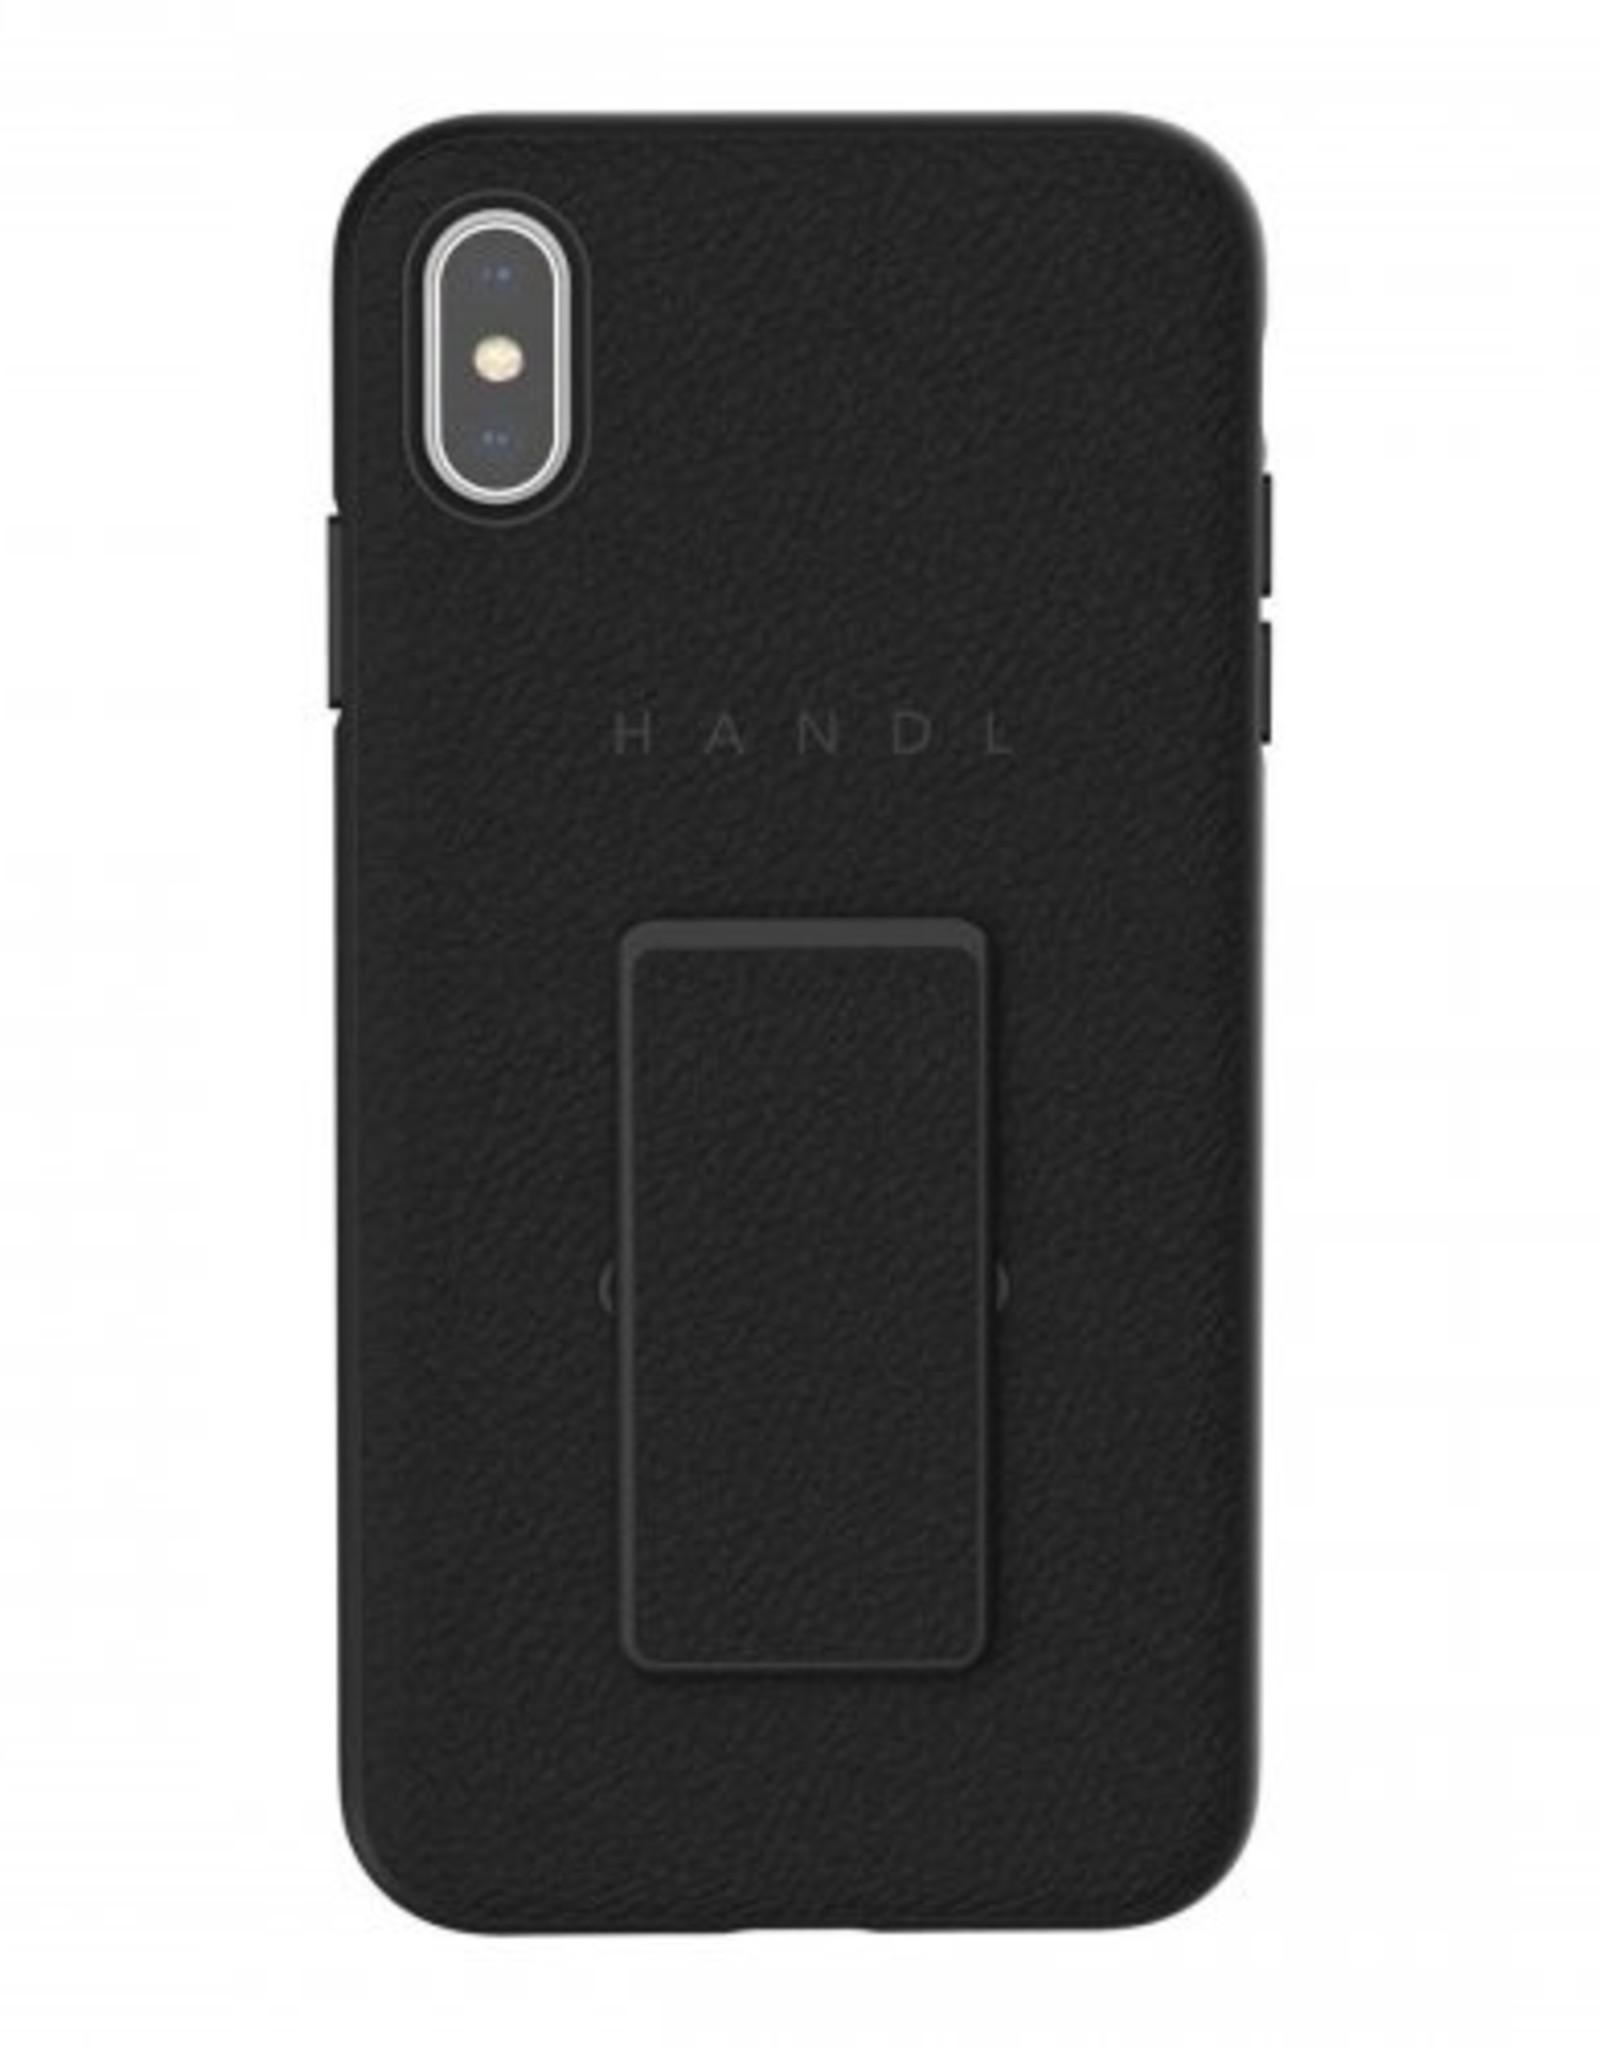 Handl | Inlay Case Black Pebble iPhone X/Xs HD-AP03PBBK